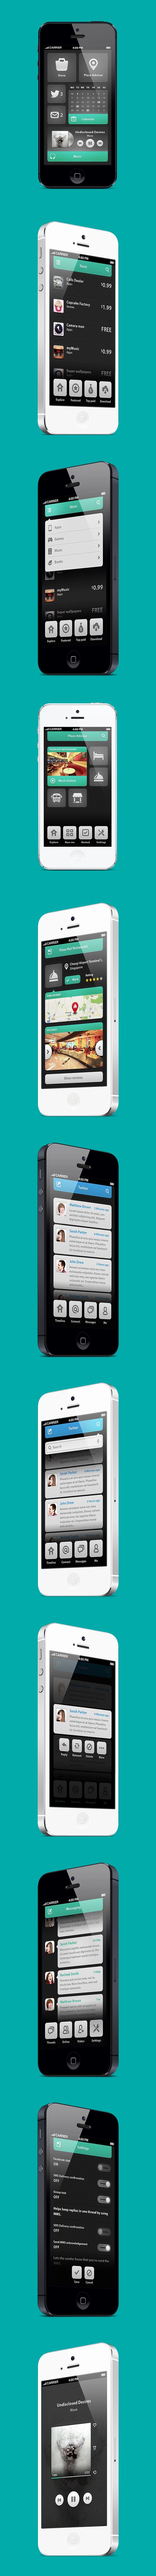 Phone UI Retina #UI #webdesign #design #designer #inspiration #user #interface #ui